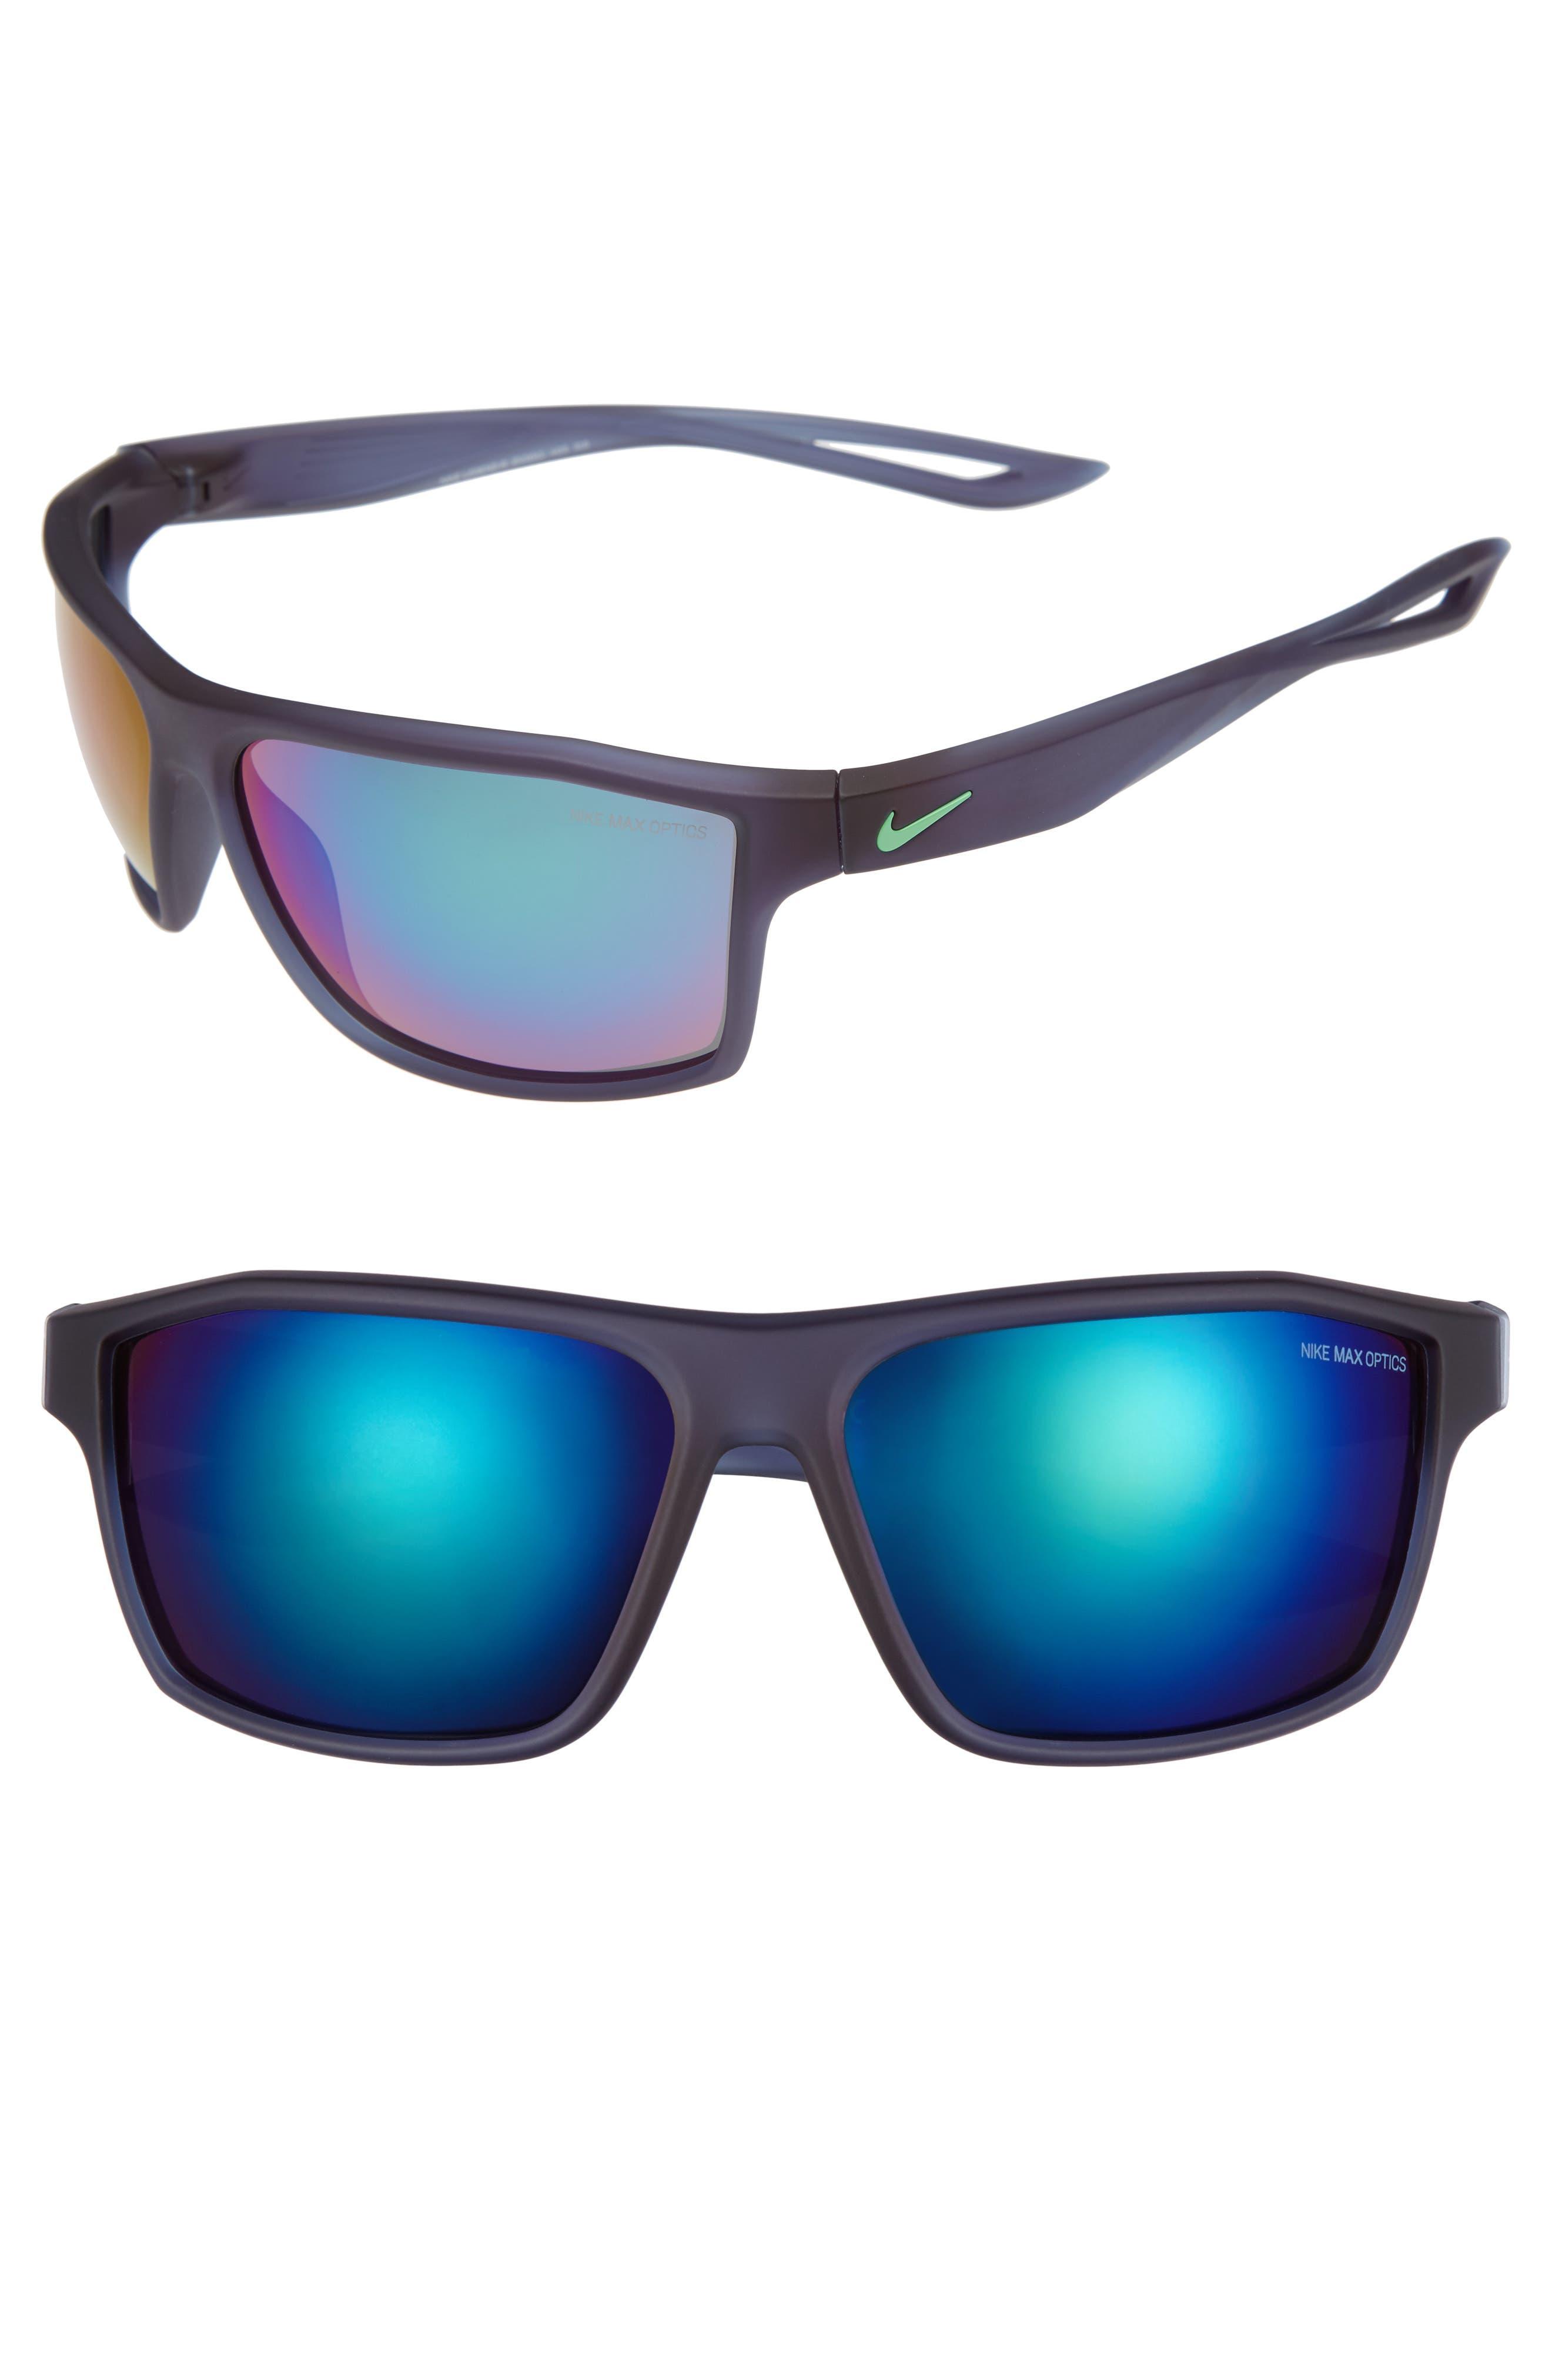 Nike Legend 65mm Mirrored Multi-Sport Sunglasses